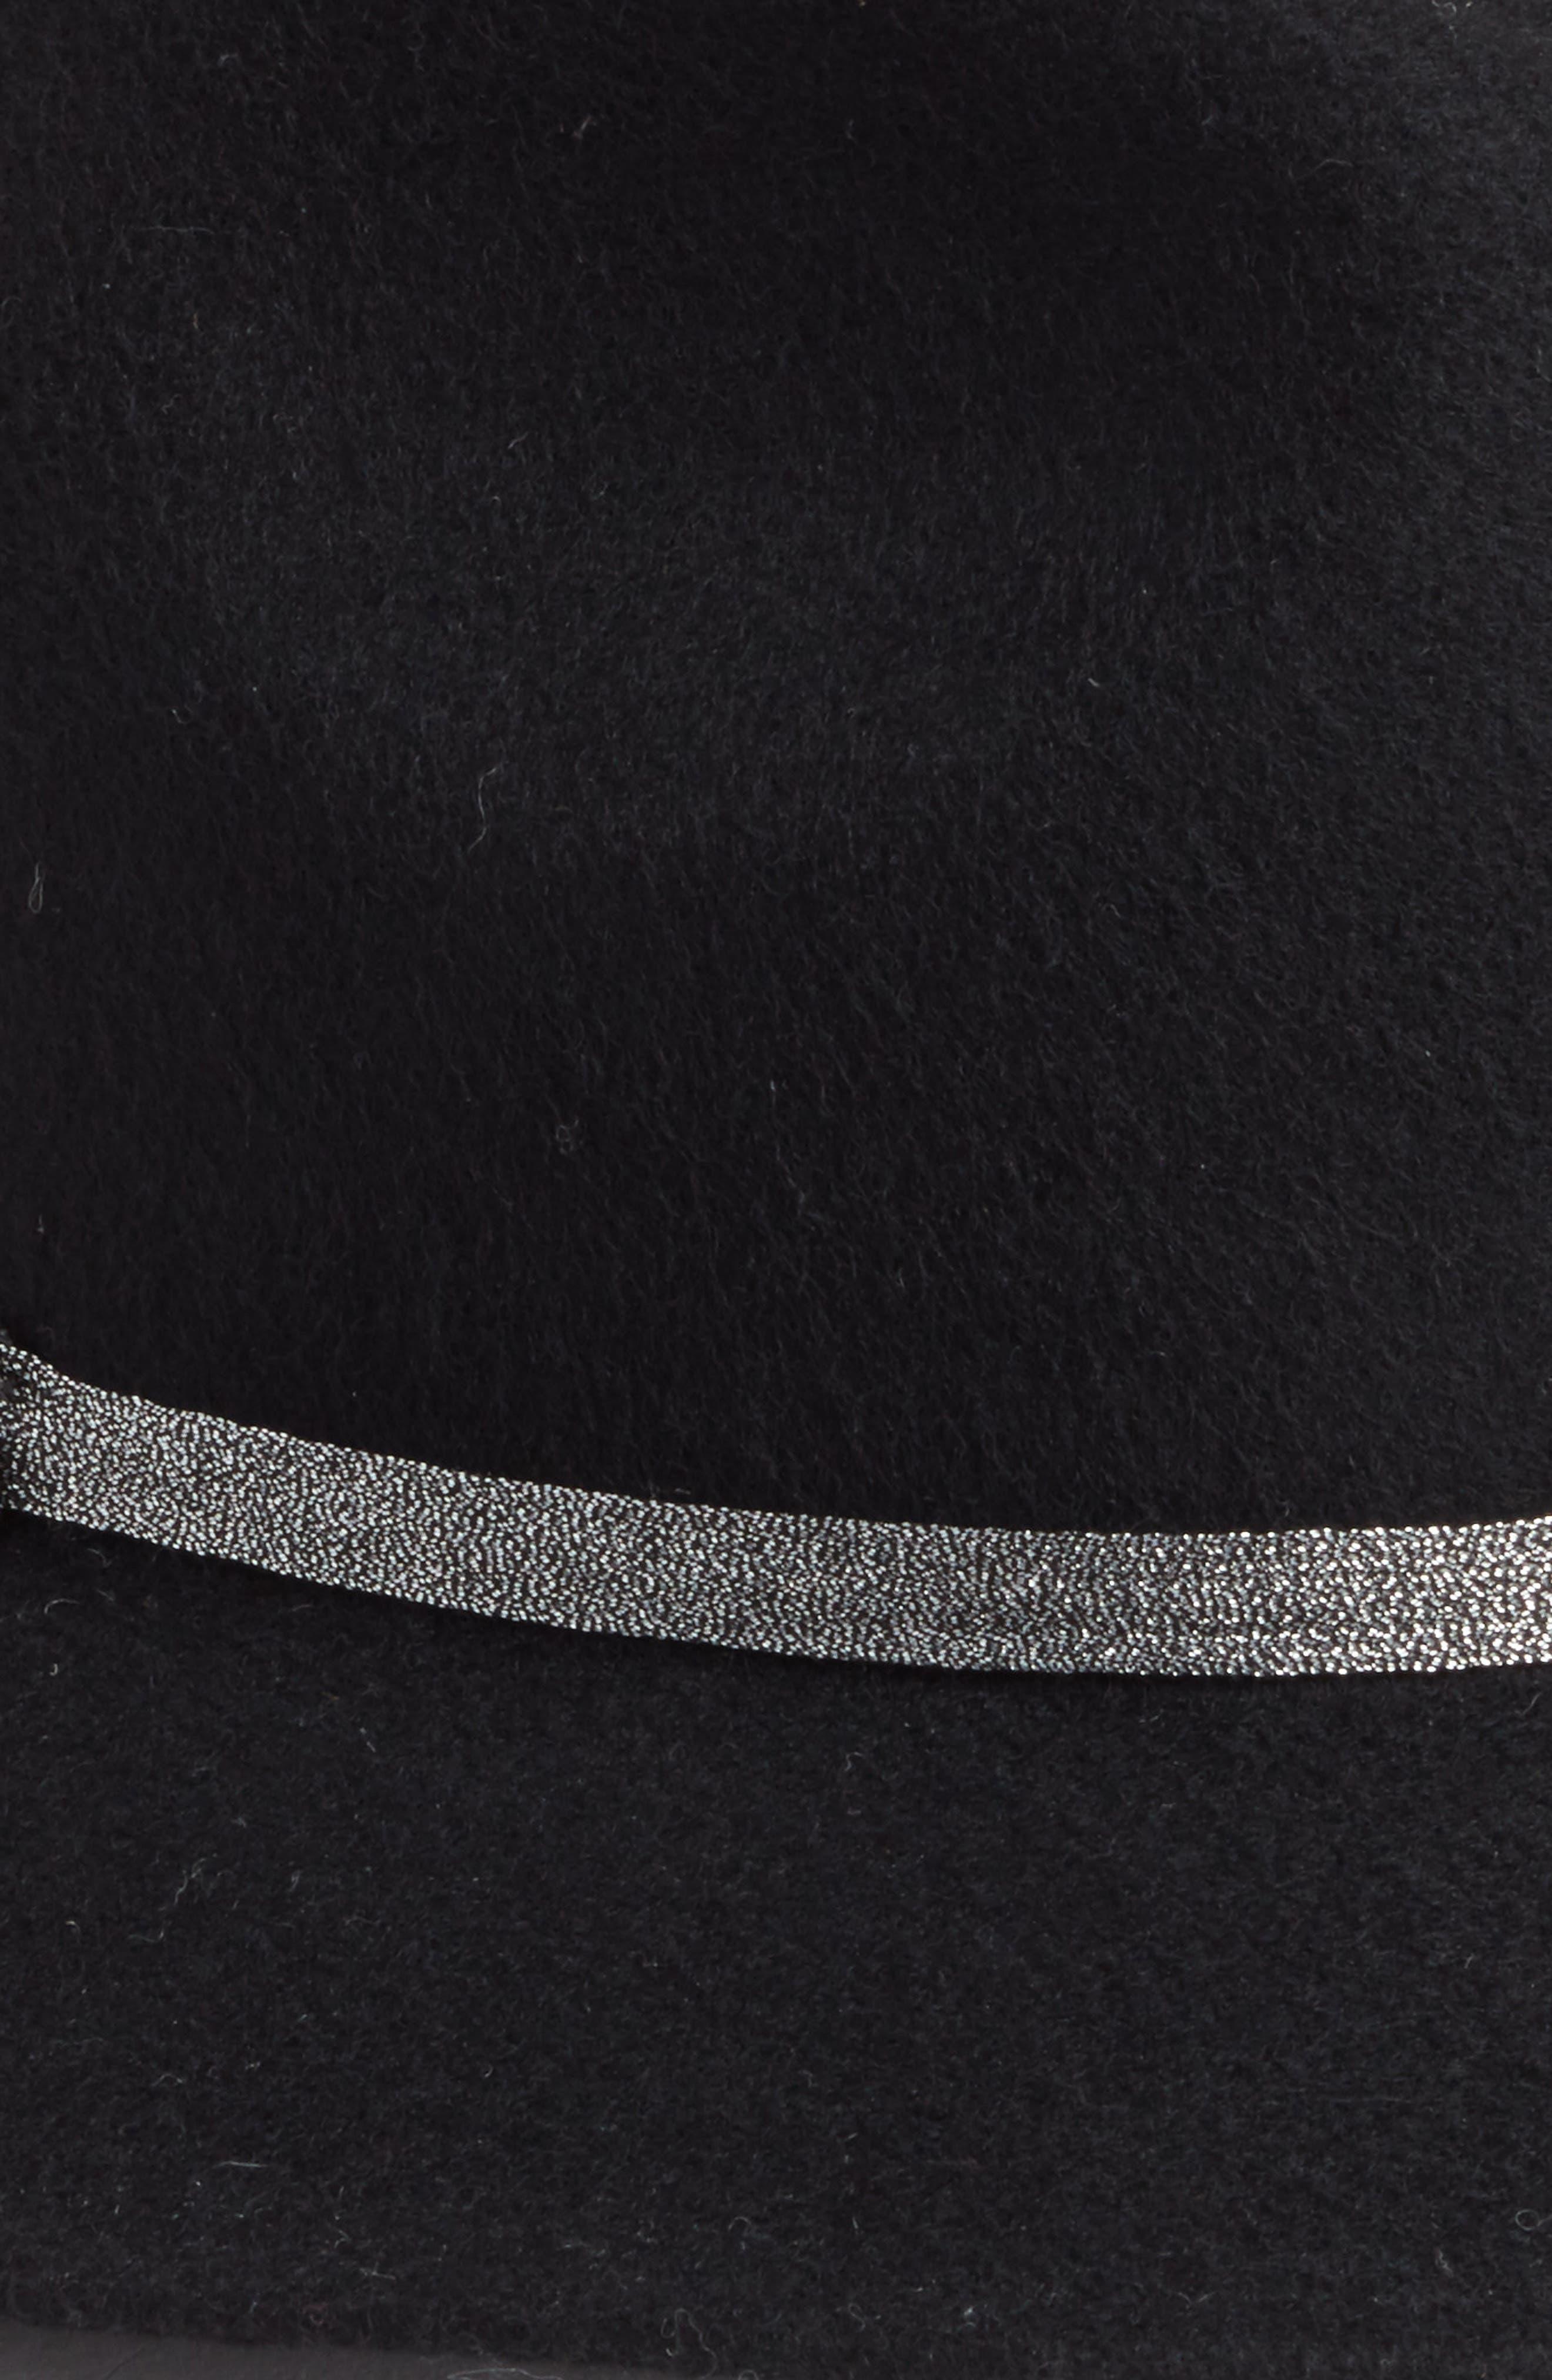 Metallic Band Wool Felt Panama Hat,                             Alternate thumbnail 2, color,                             BLACK